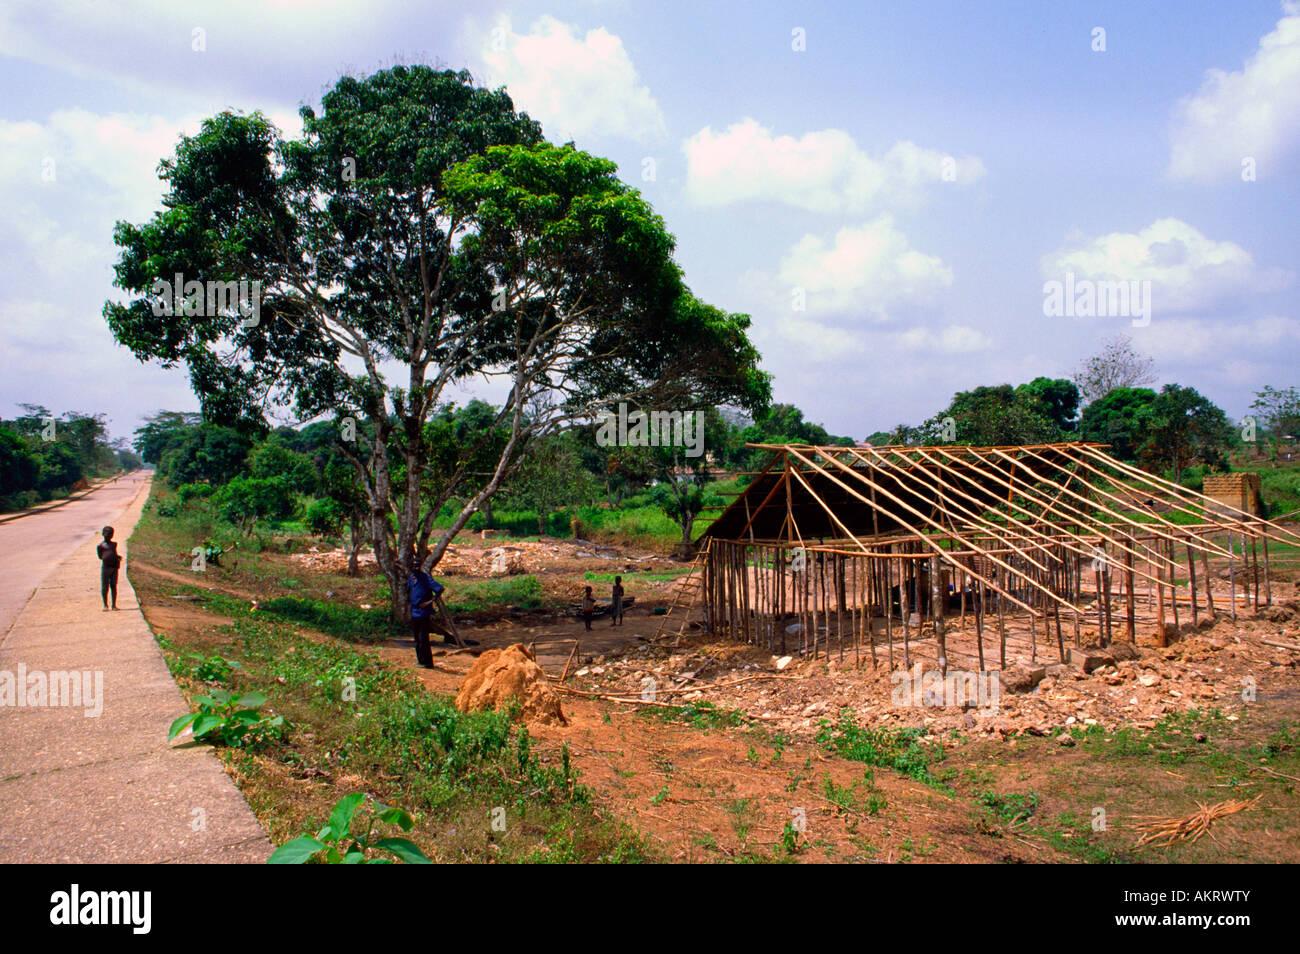 A man rebuilds a house in the aftermath of civil war in Zwedru Liberia - Stock Image